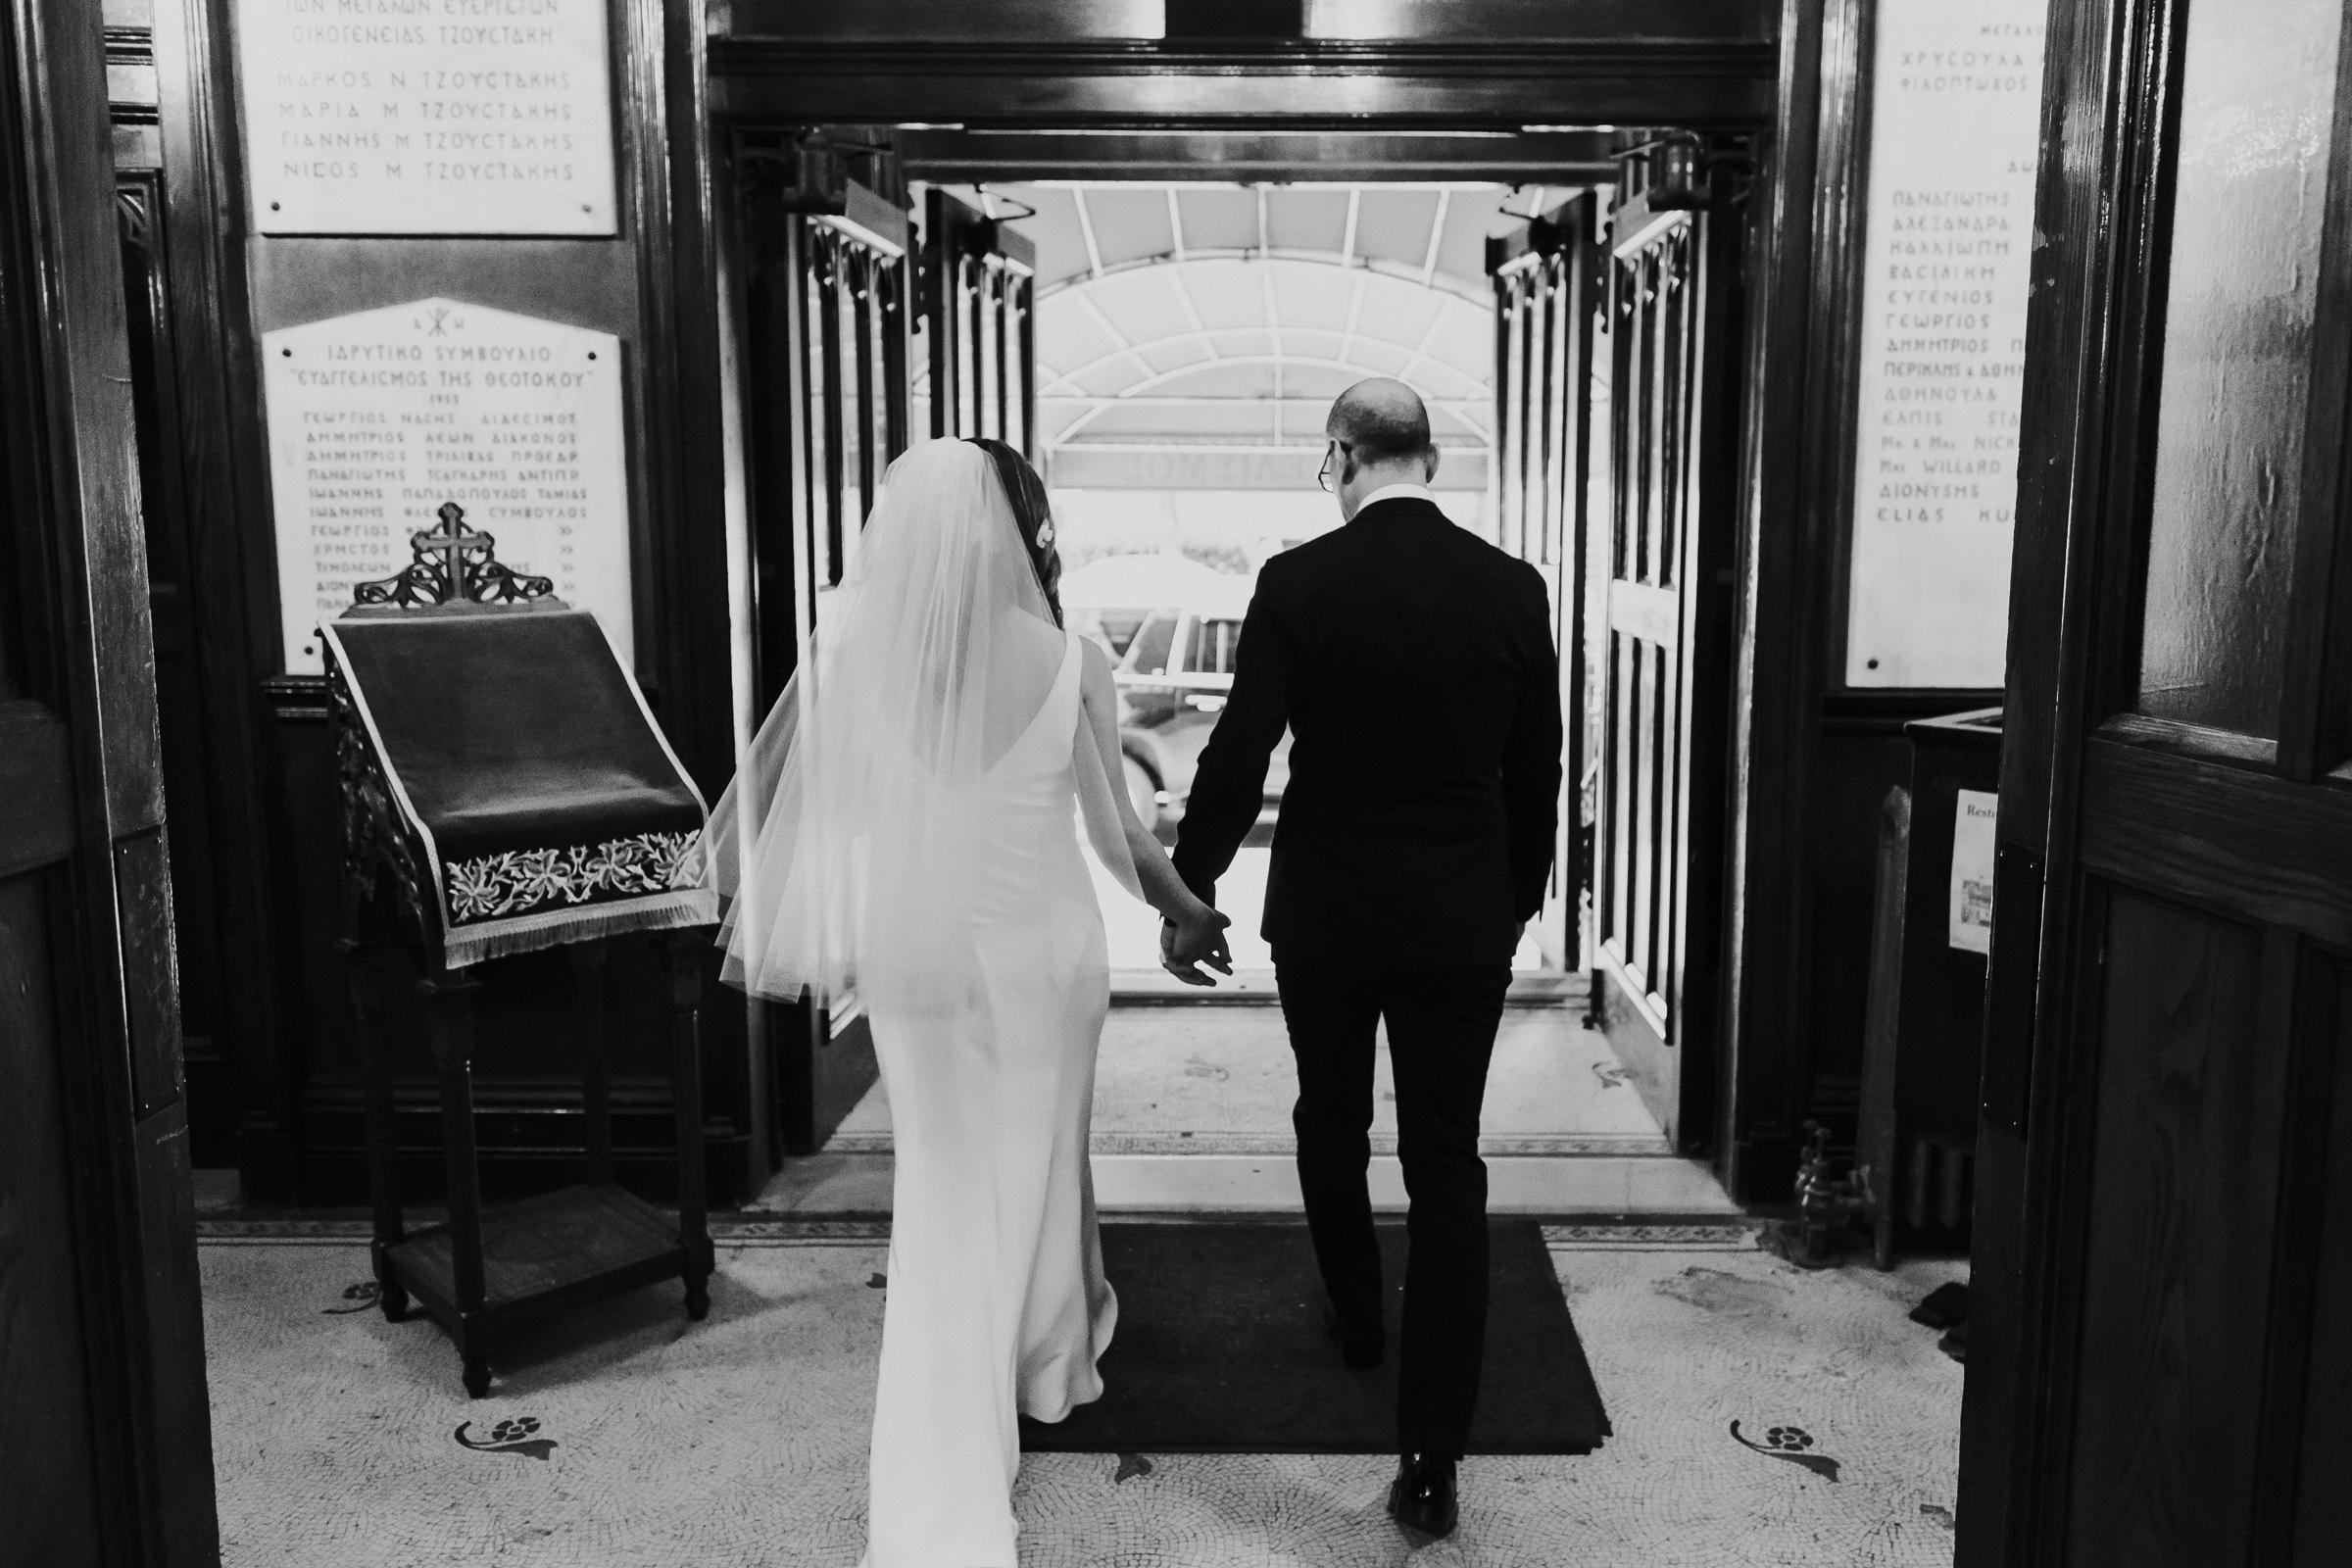 Robert-NYC-Museum-Of-Arts-&-Design-Greek-Italian-New-York-Documentary-Wedding-Photographer-21.jpg